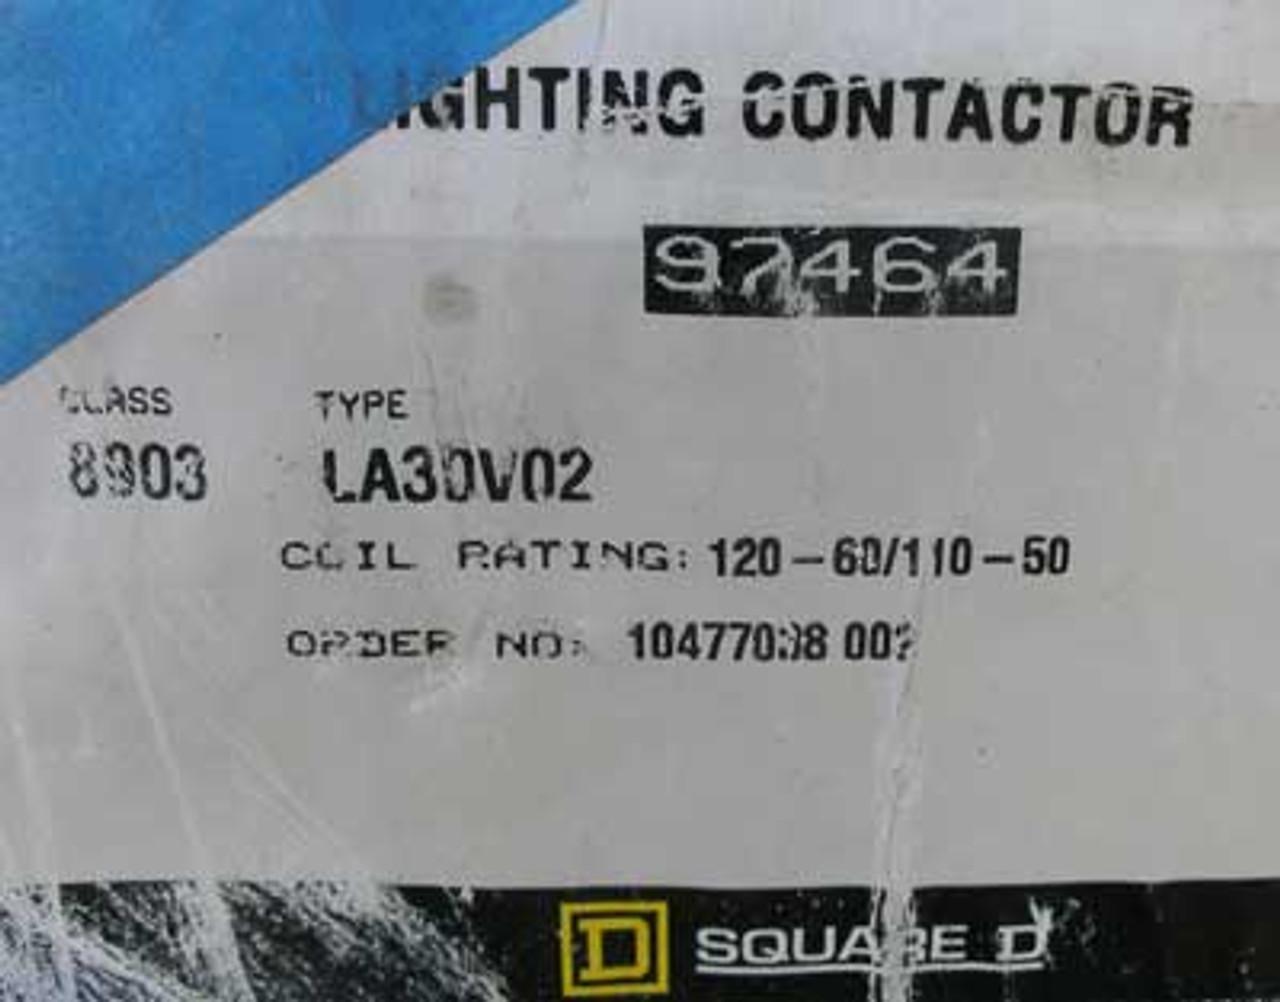 Square D 8903 LA30V02 Lighting Contactor 3 Pole 30 Amp Nema 12/3R - New